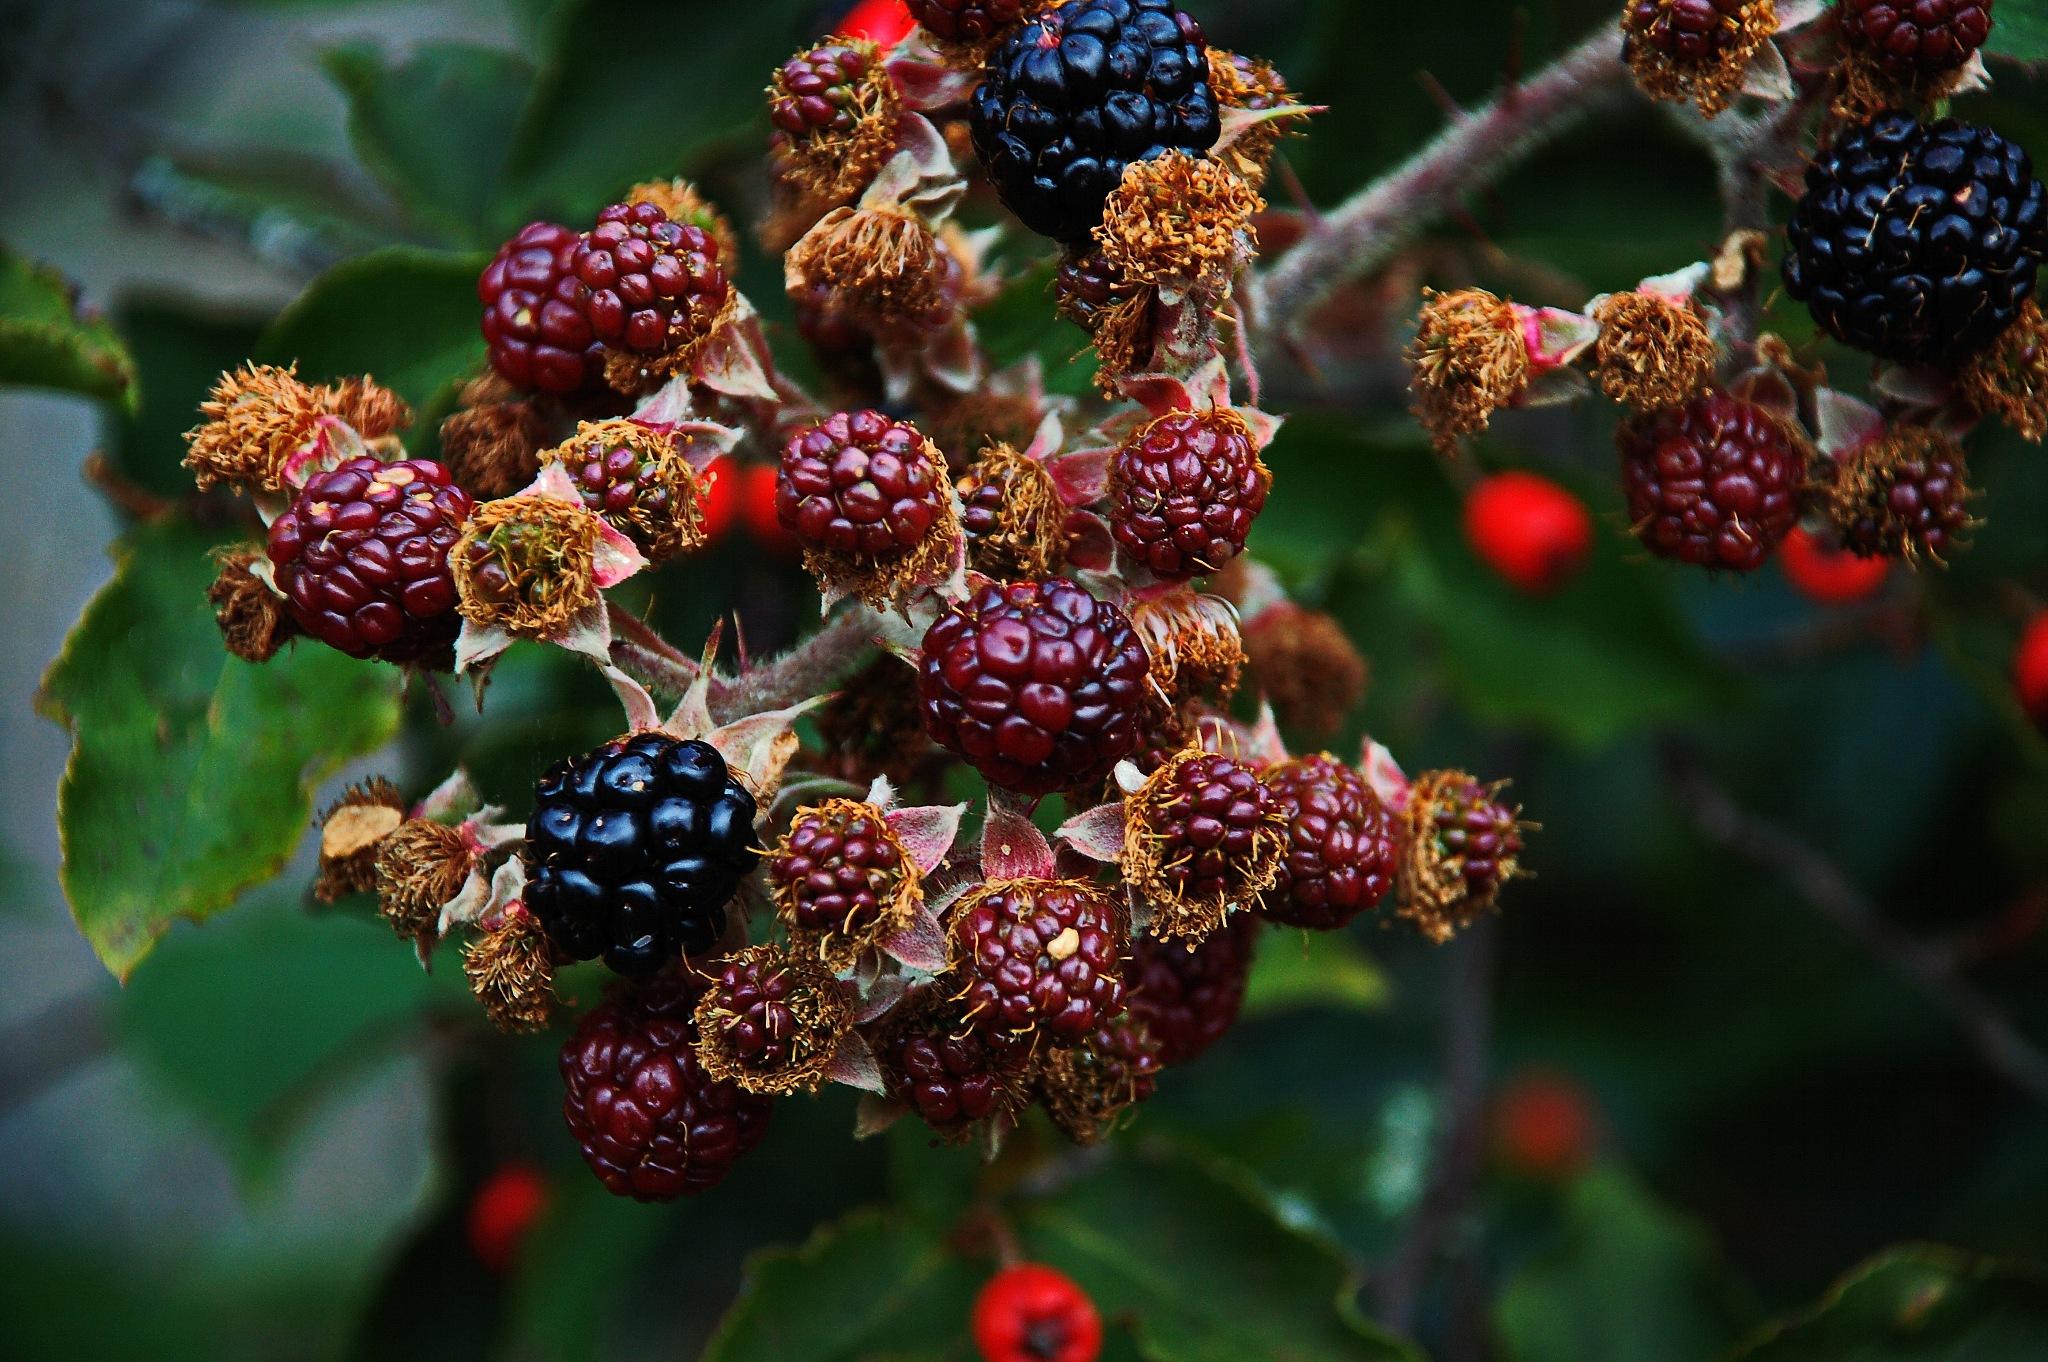 Blackberry by Per Molvik